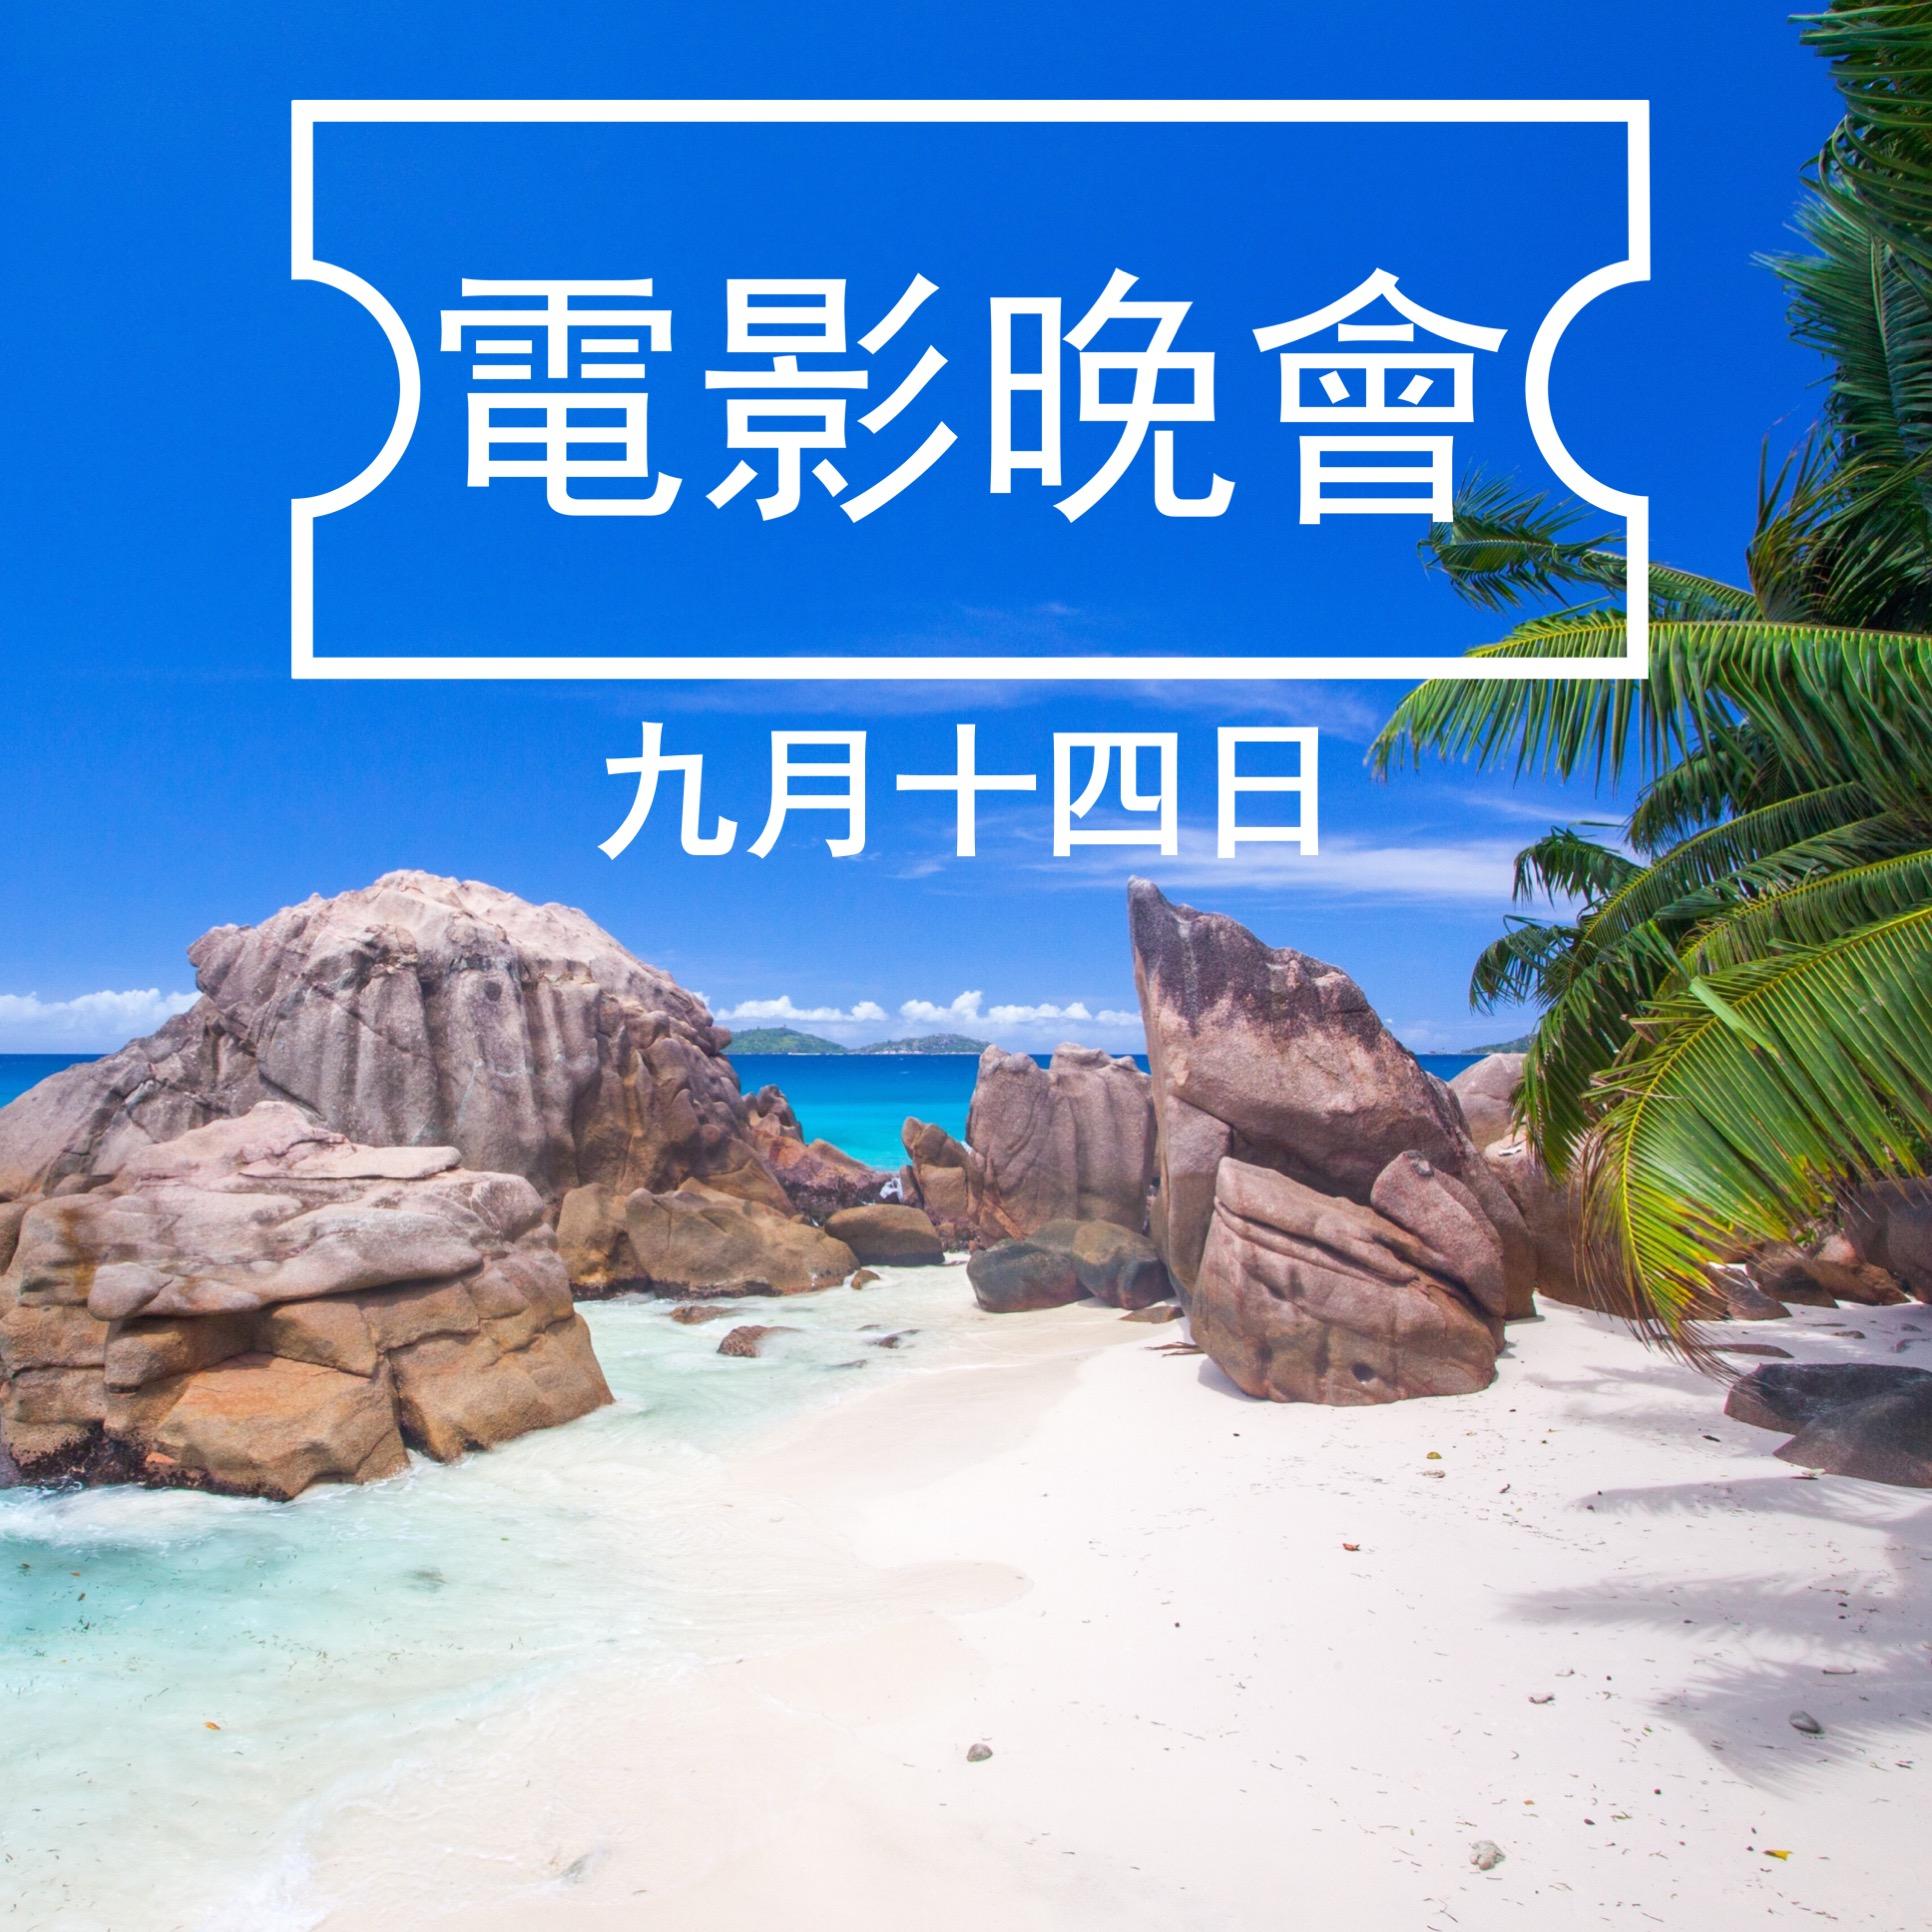 Instagram_Chinese (1).jpg